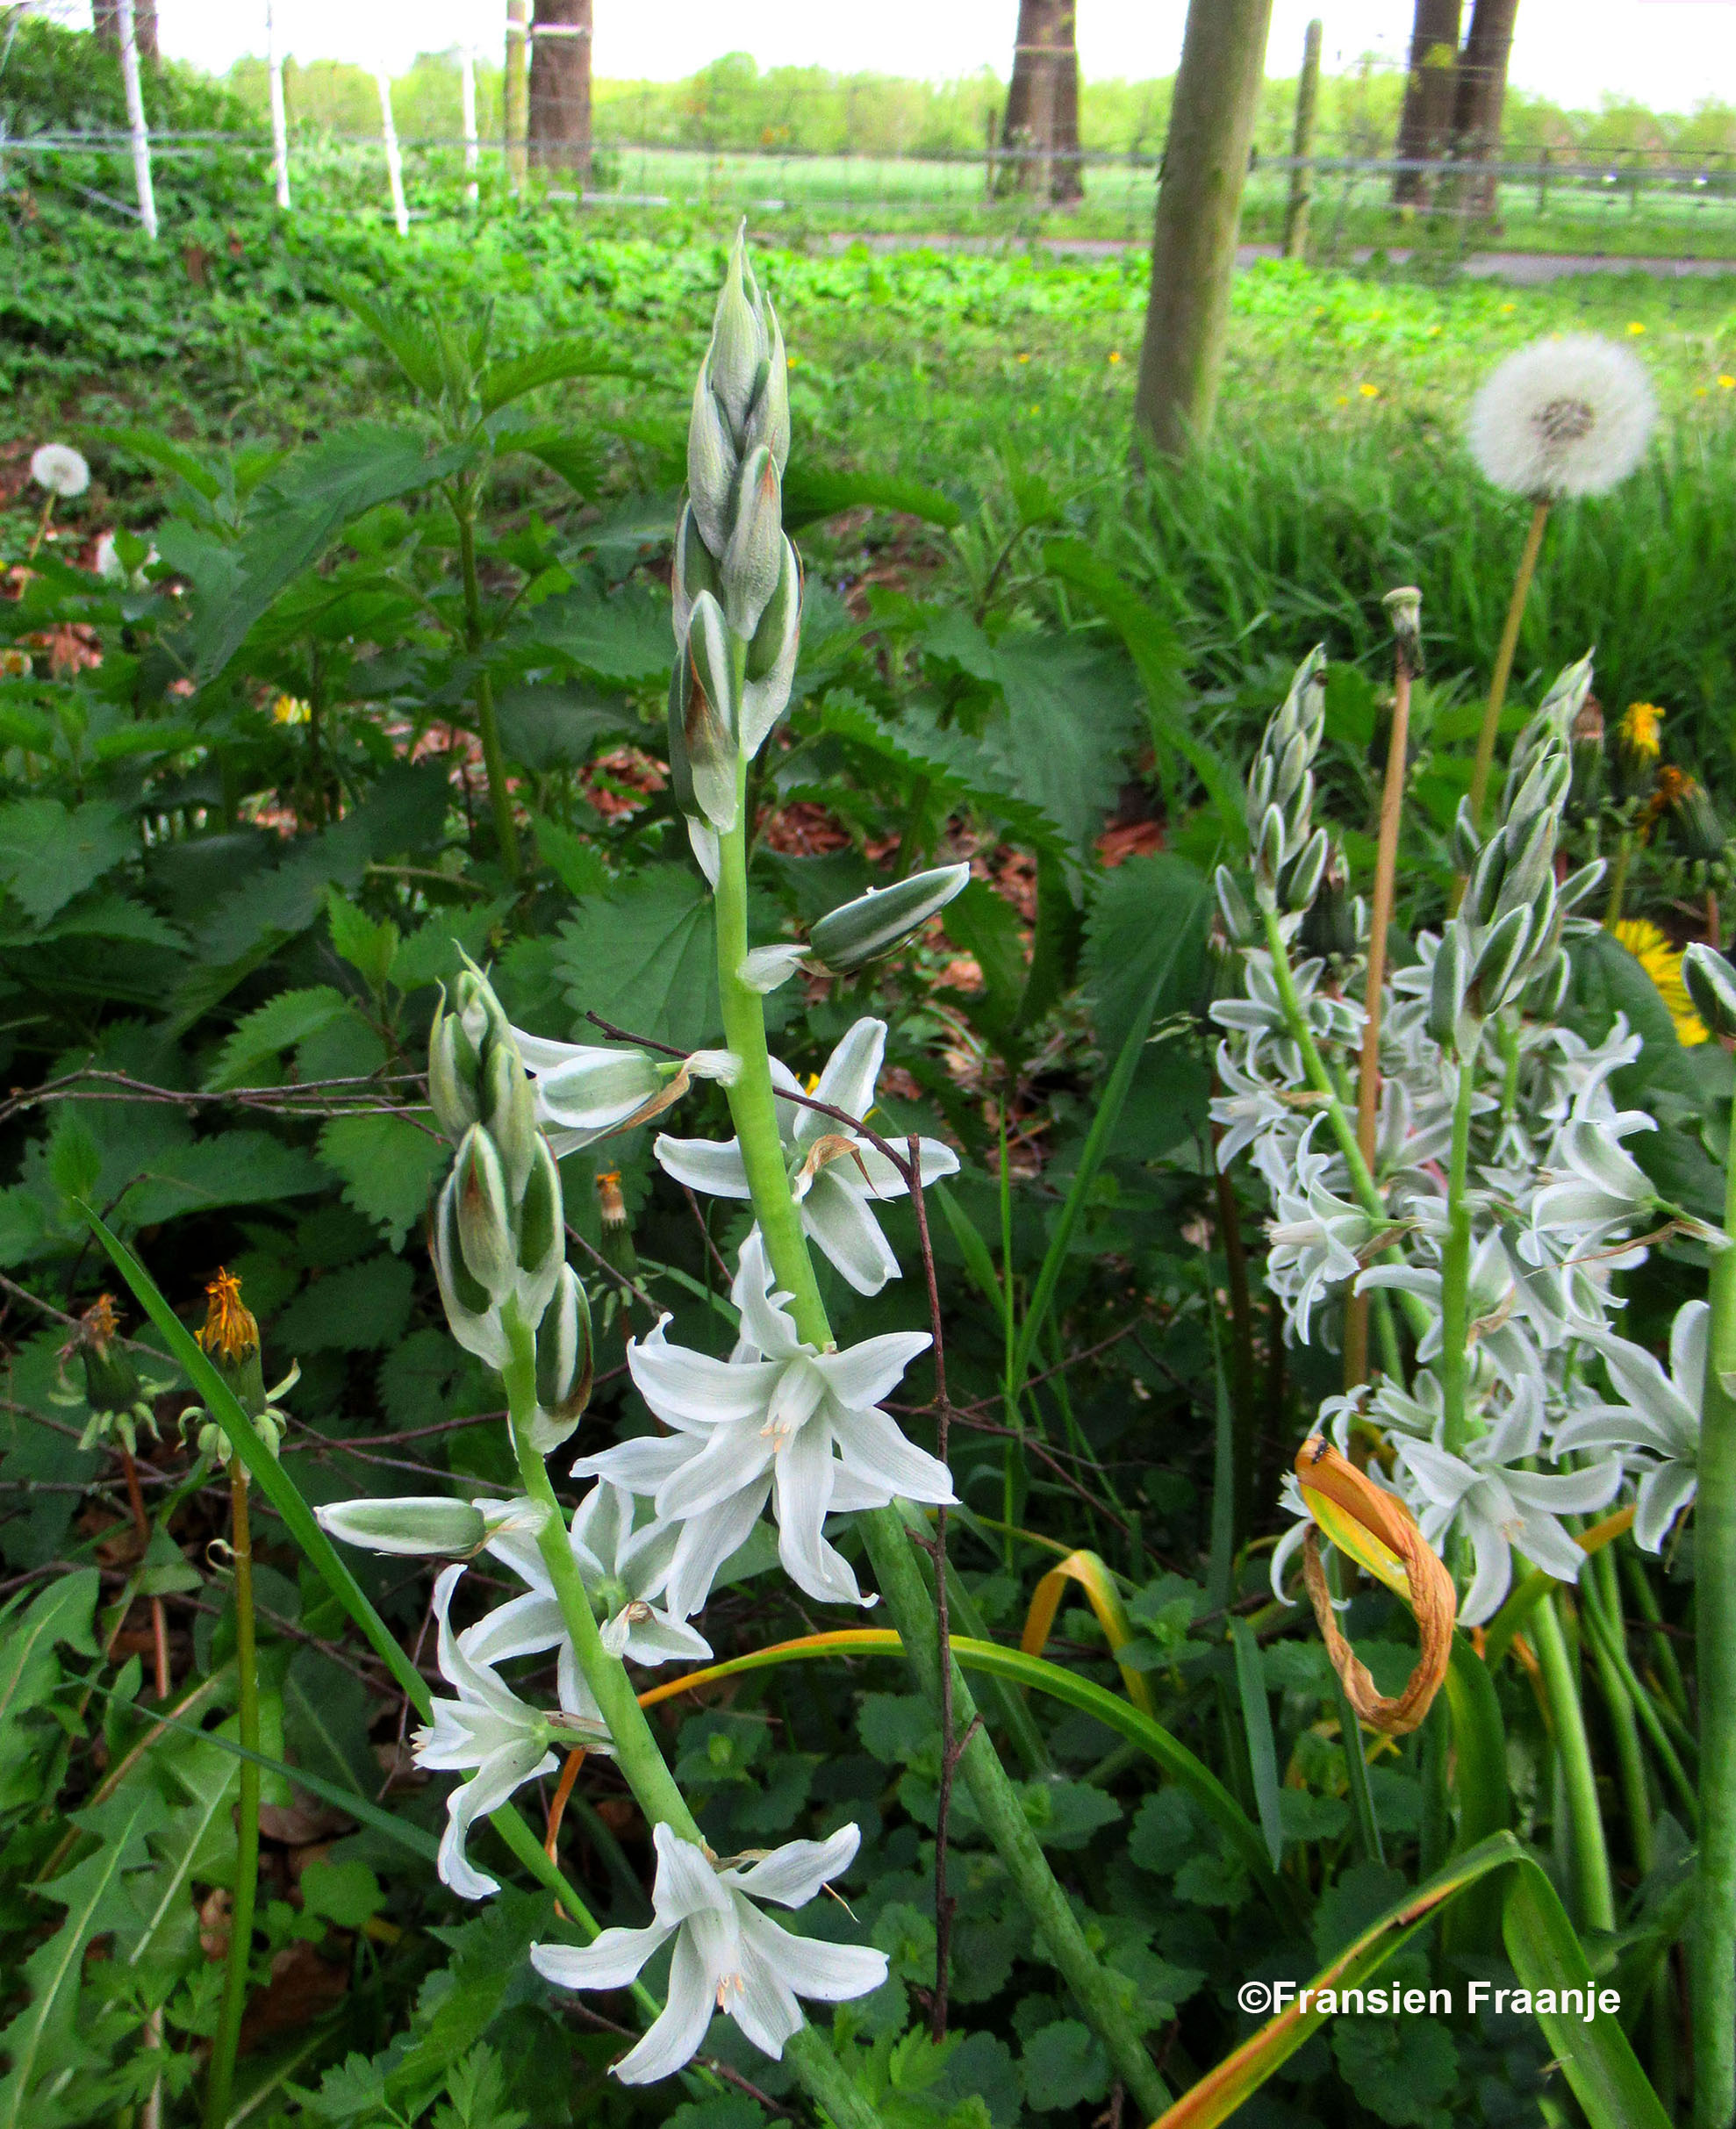 Deze speciale plant stond in de wegberm, het is knikkende vogelmelk - Foto: ©Fransien Fraanje